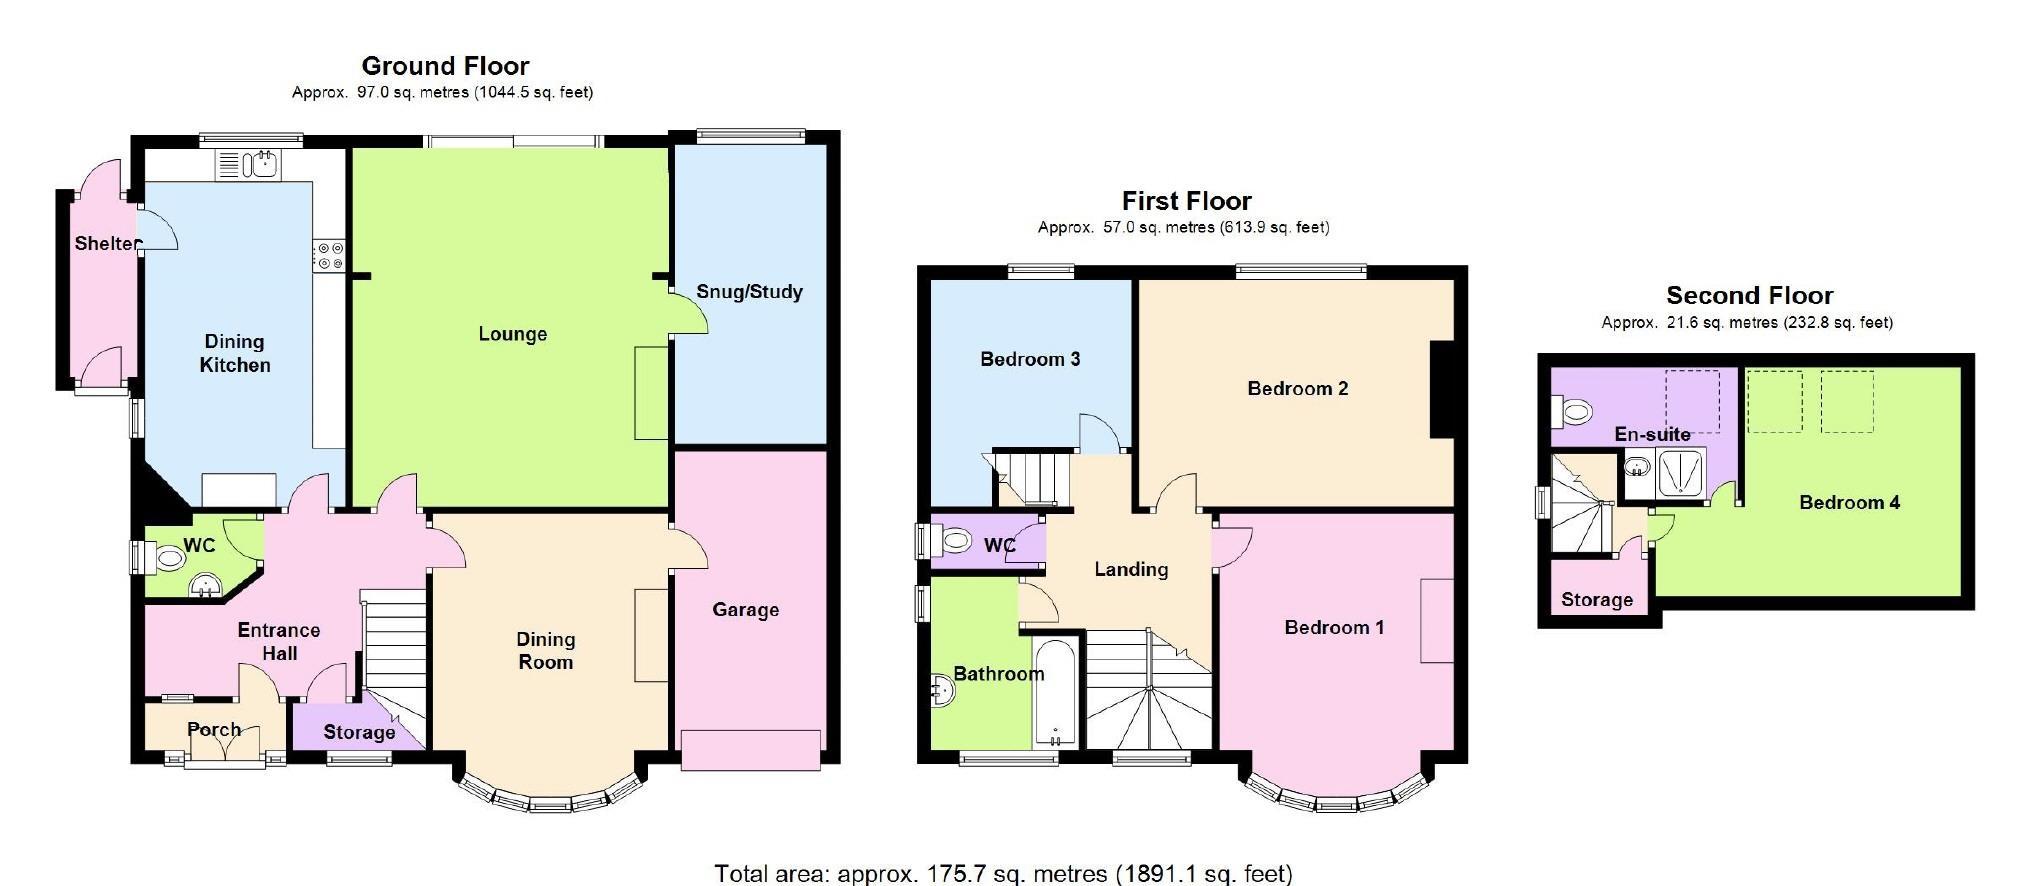 Bedroom Properties For Sale In West Bridgford